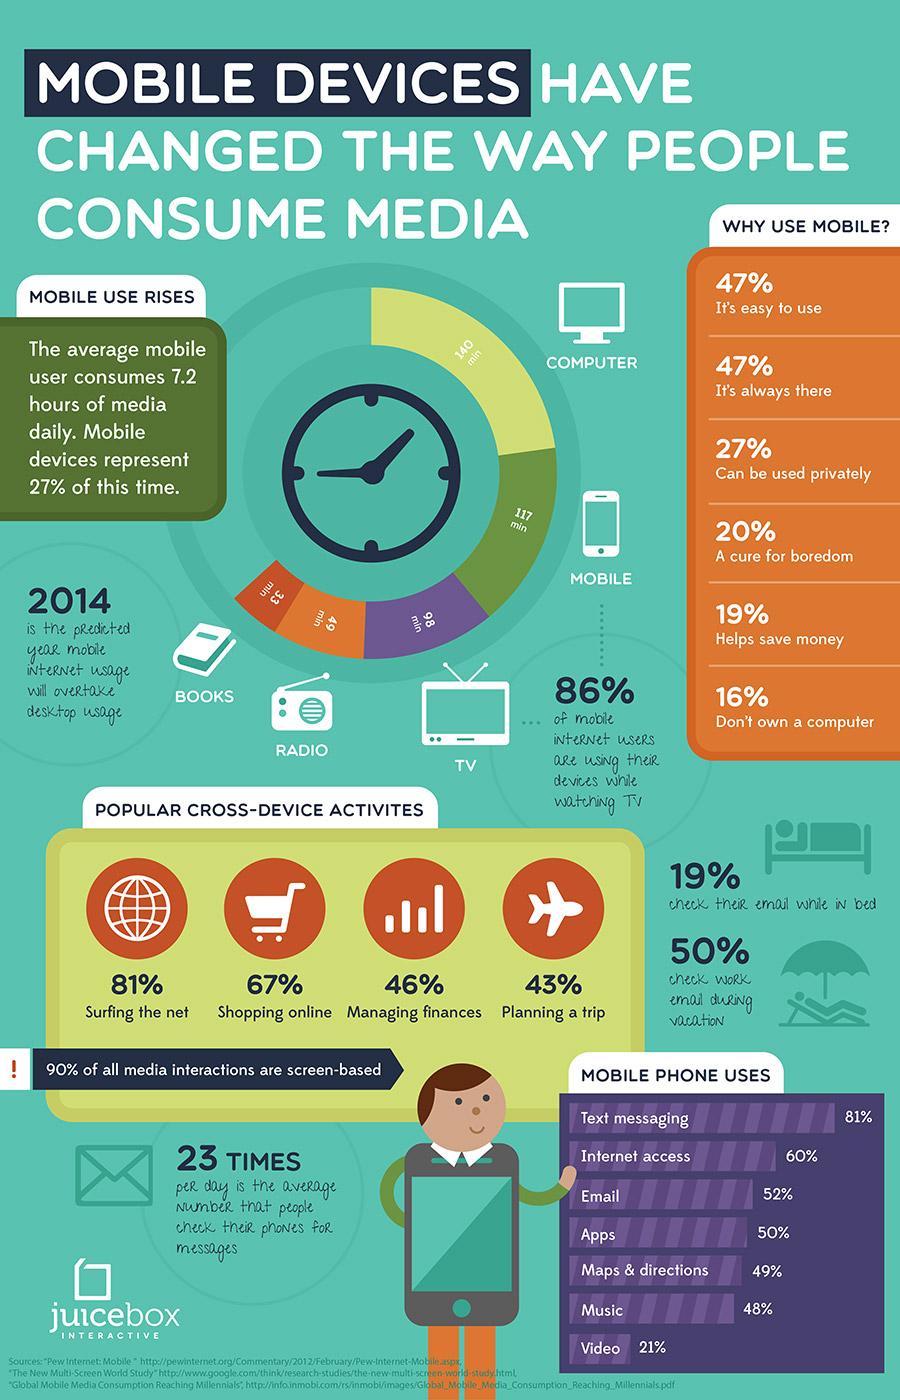 Mobile device consumption